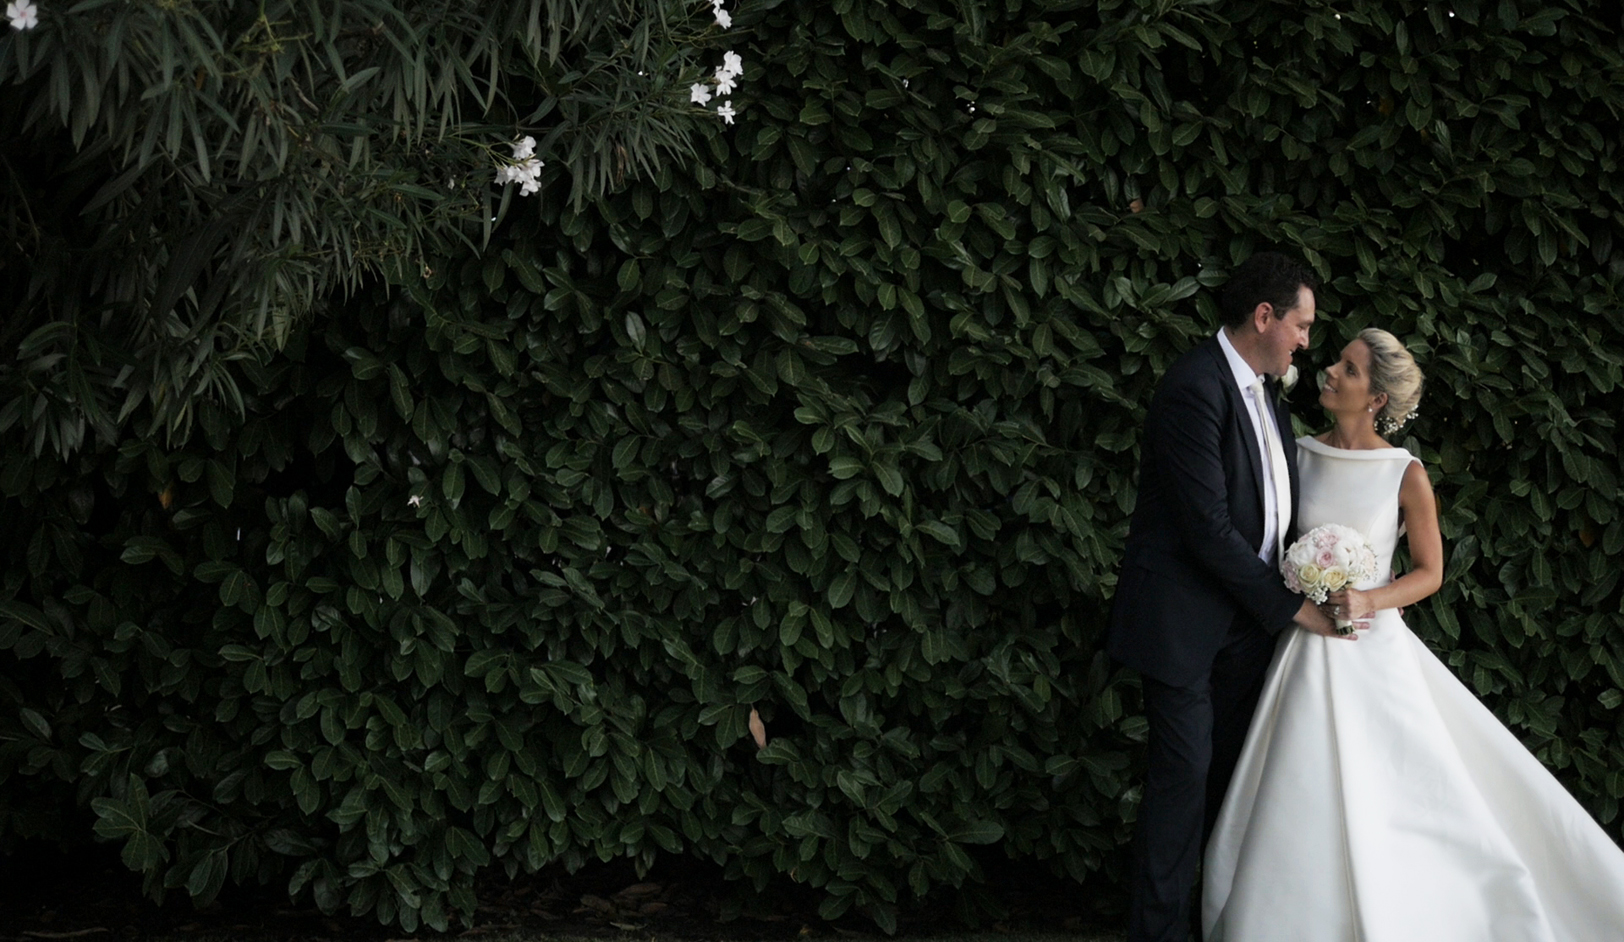 matrimonio-a-ravello-villa-eva-villa-cimbrone-italia.jpg